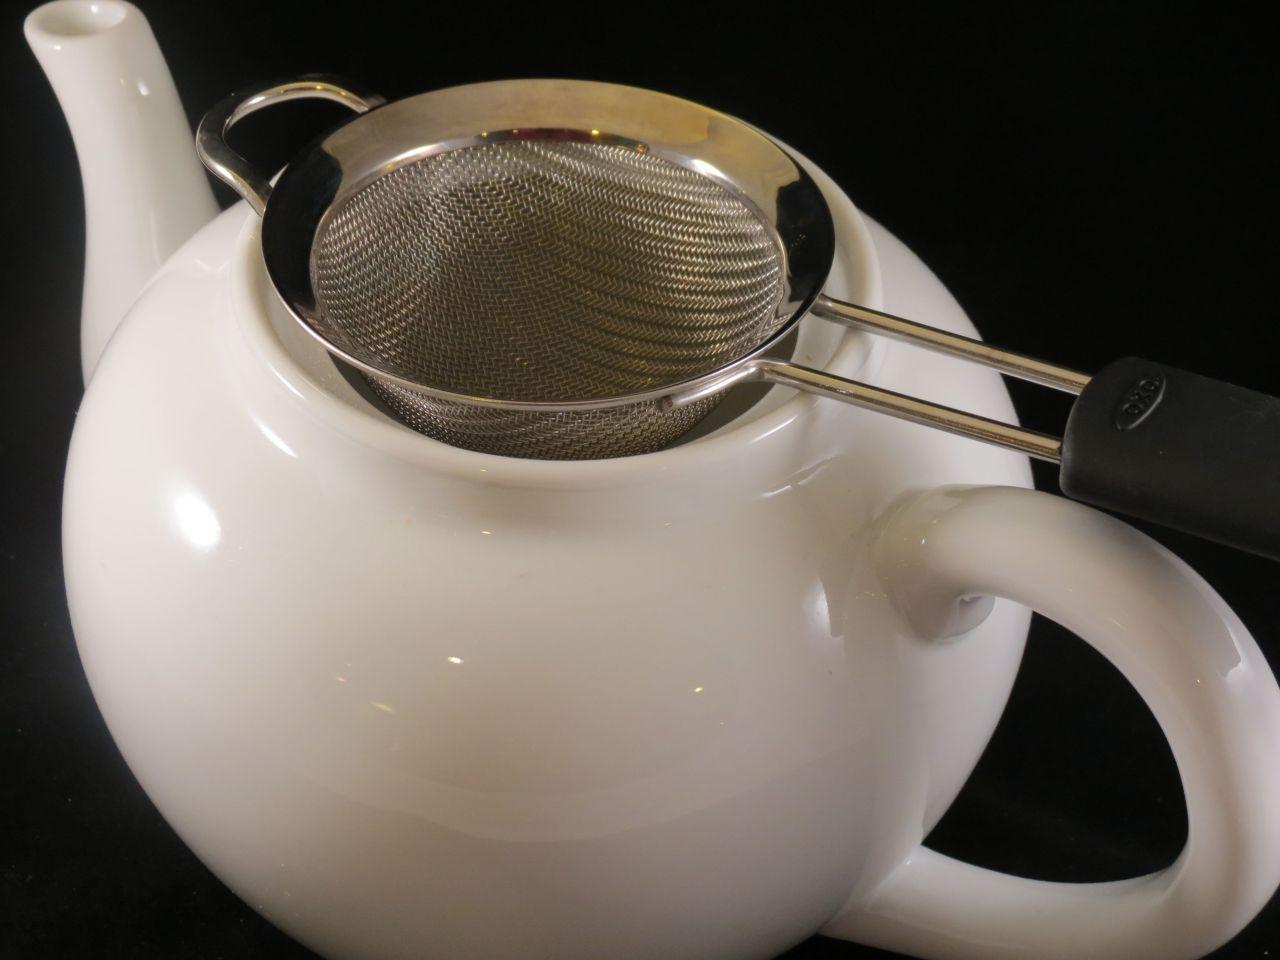 Masala Adrak Chai strain tea into a tea pot